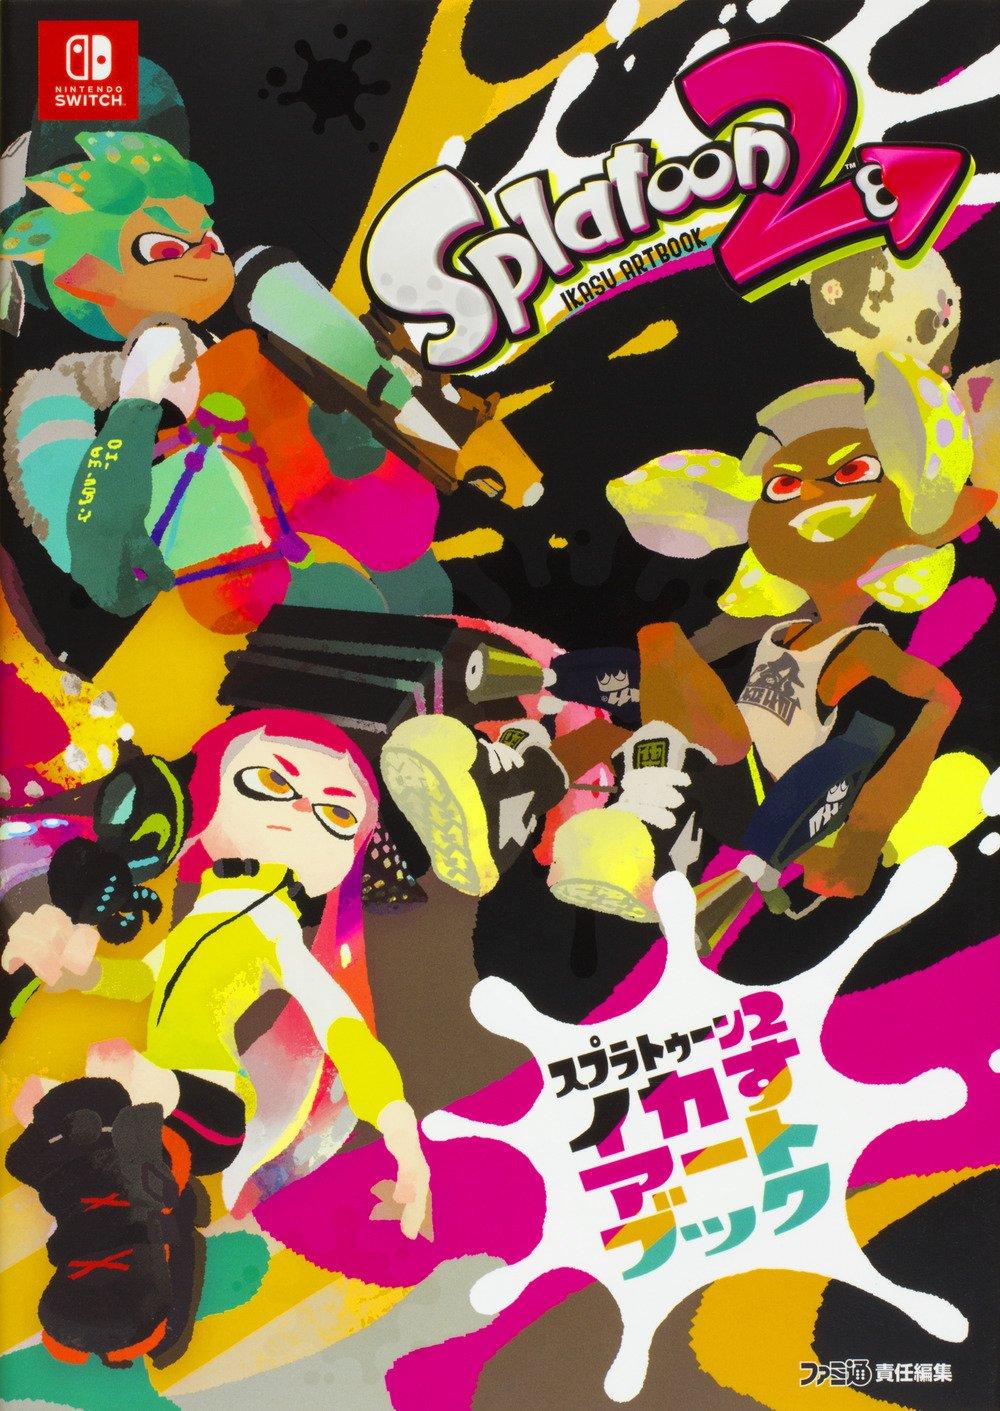 Splatoon 2 Ikasu Art Book 2017 11/29: KADOKAWA ...